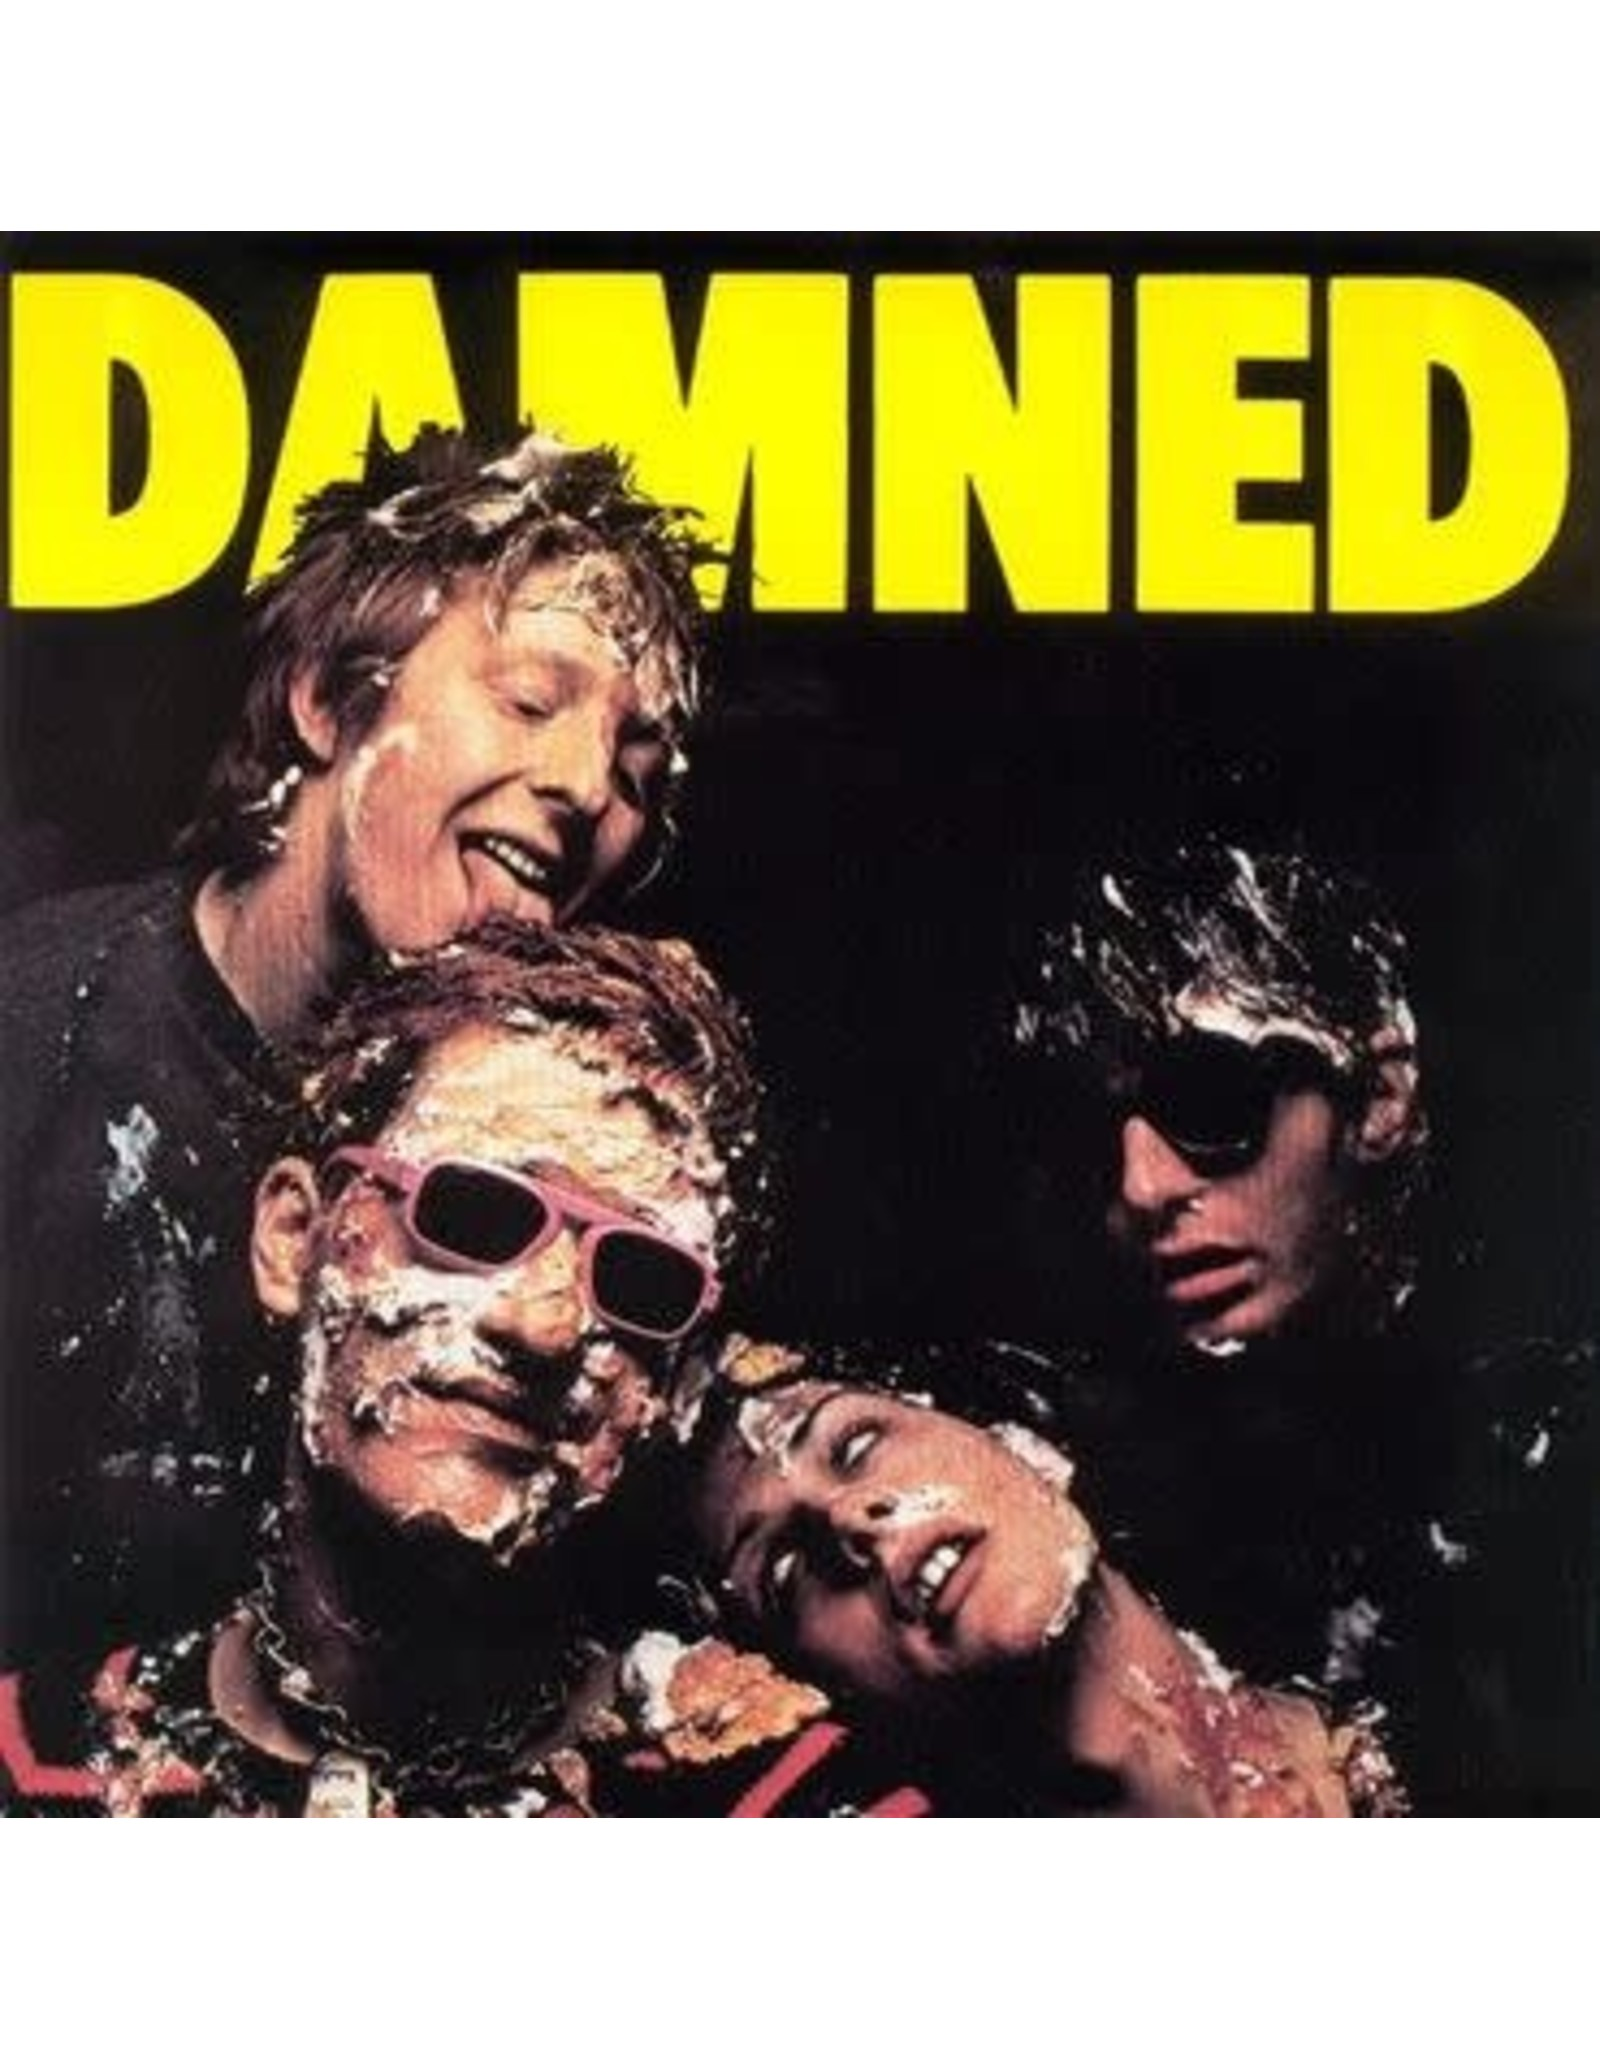 BMG Damned: Damned Damned Damned (2017 remaster) LP